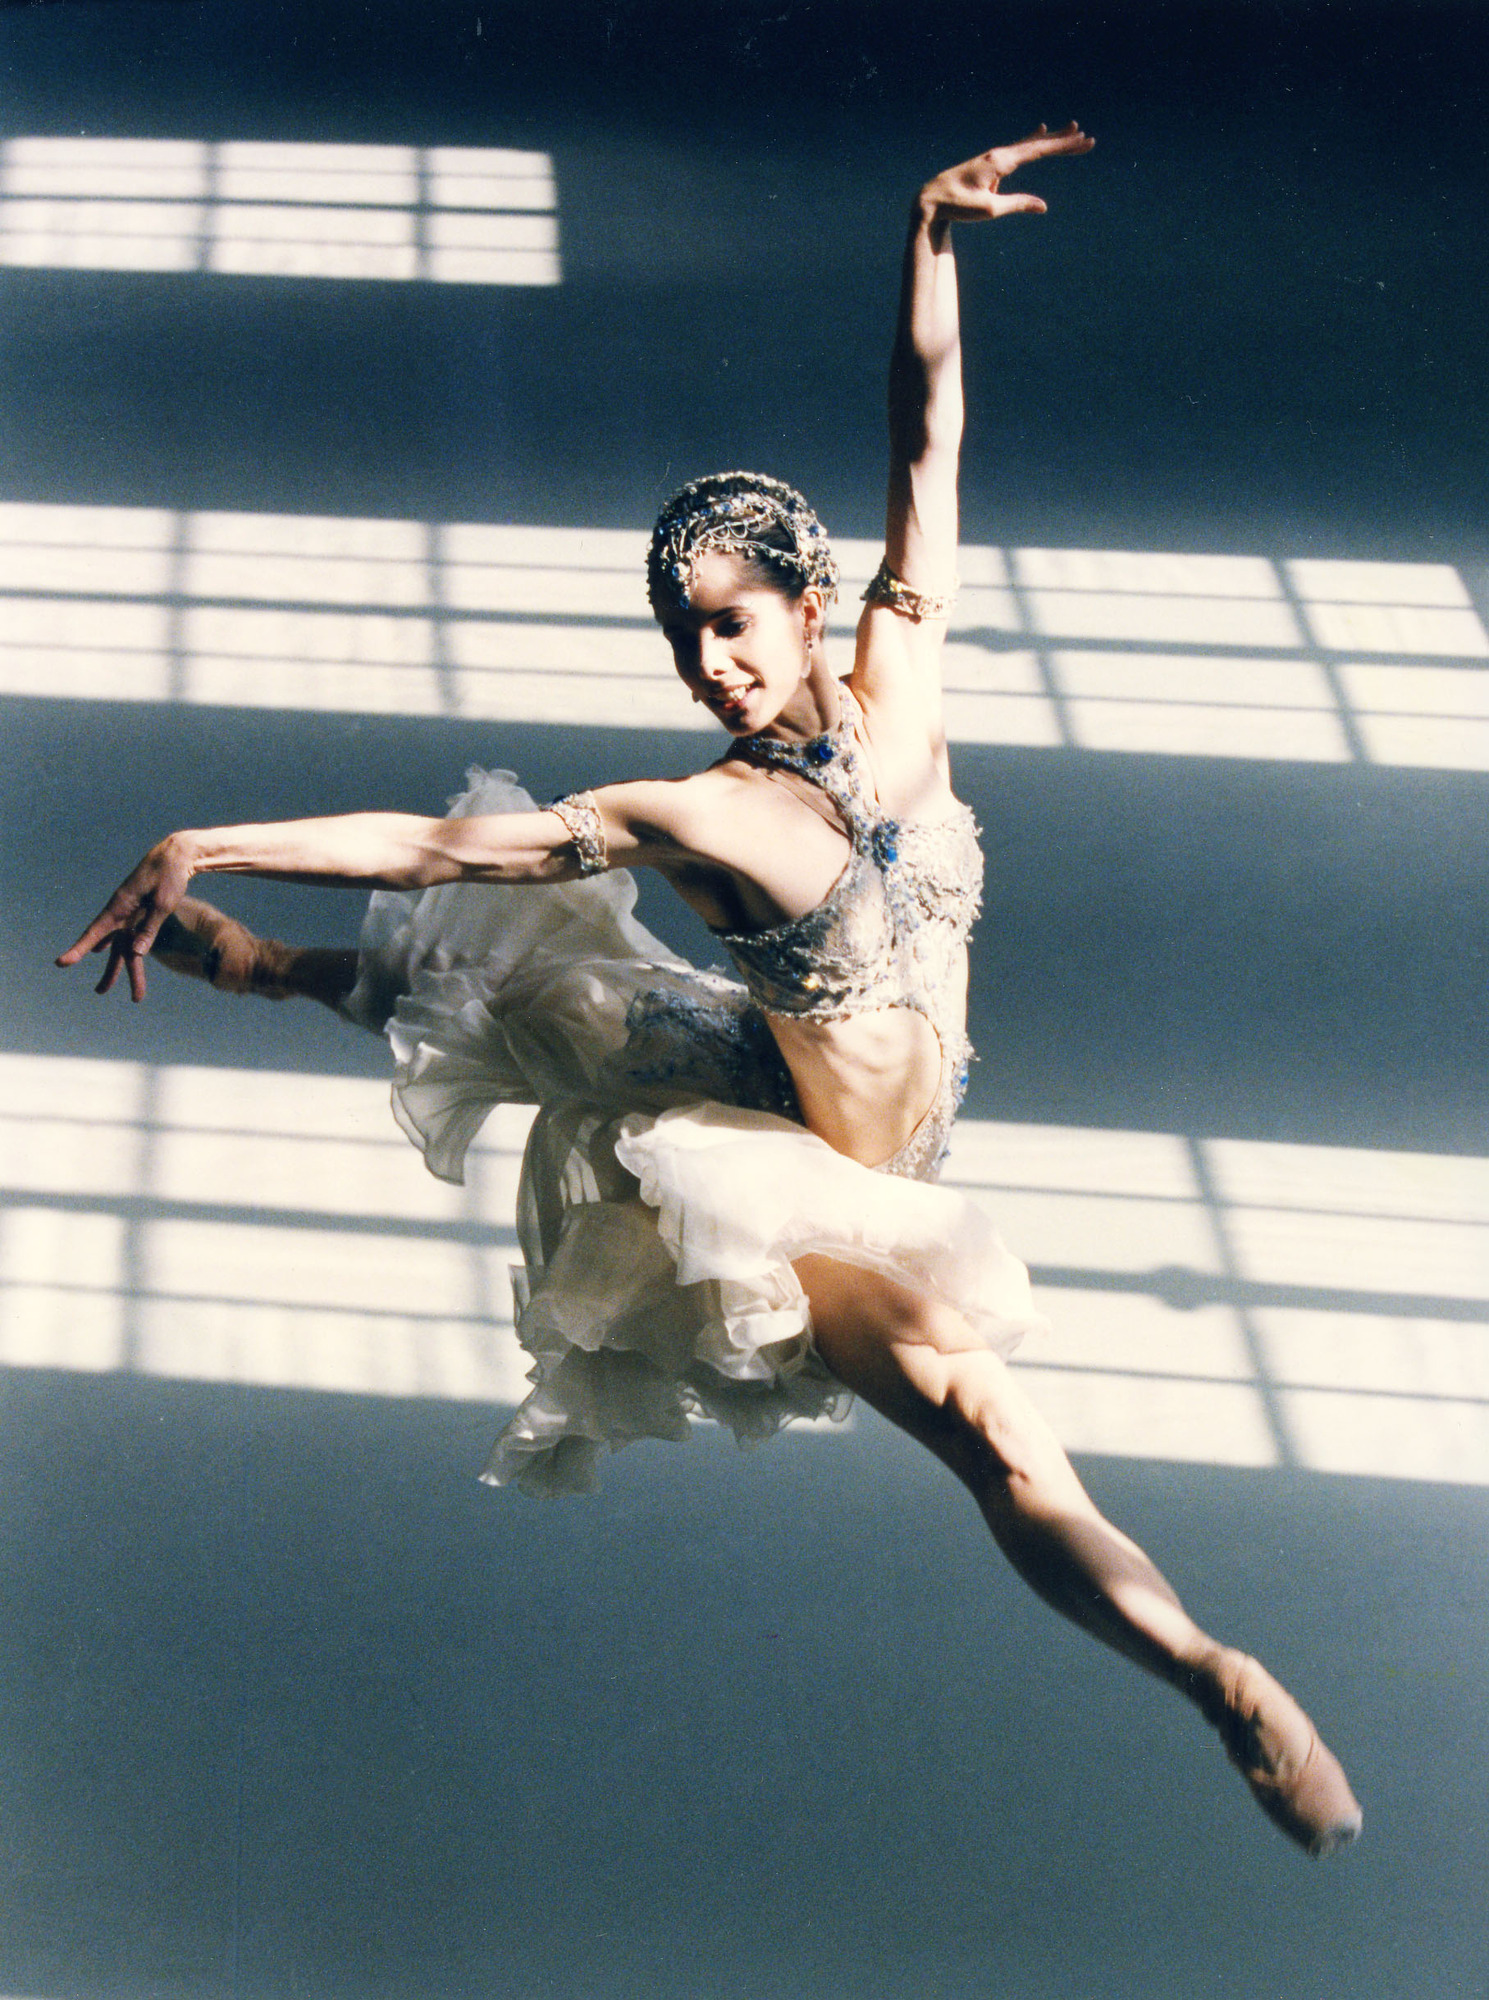 former principal ballerina for the Royal Ballet in rehearsal for La Bayadere - taken circa 1998. Darcey Bussell - (C) BBC - Photographer: Stephen Vaughan